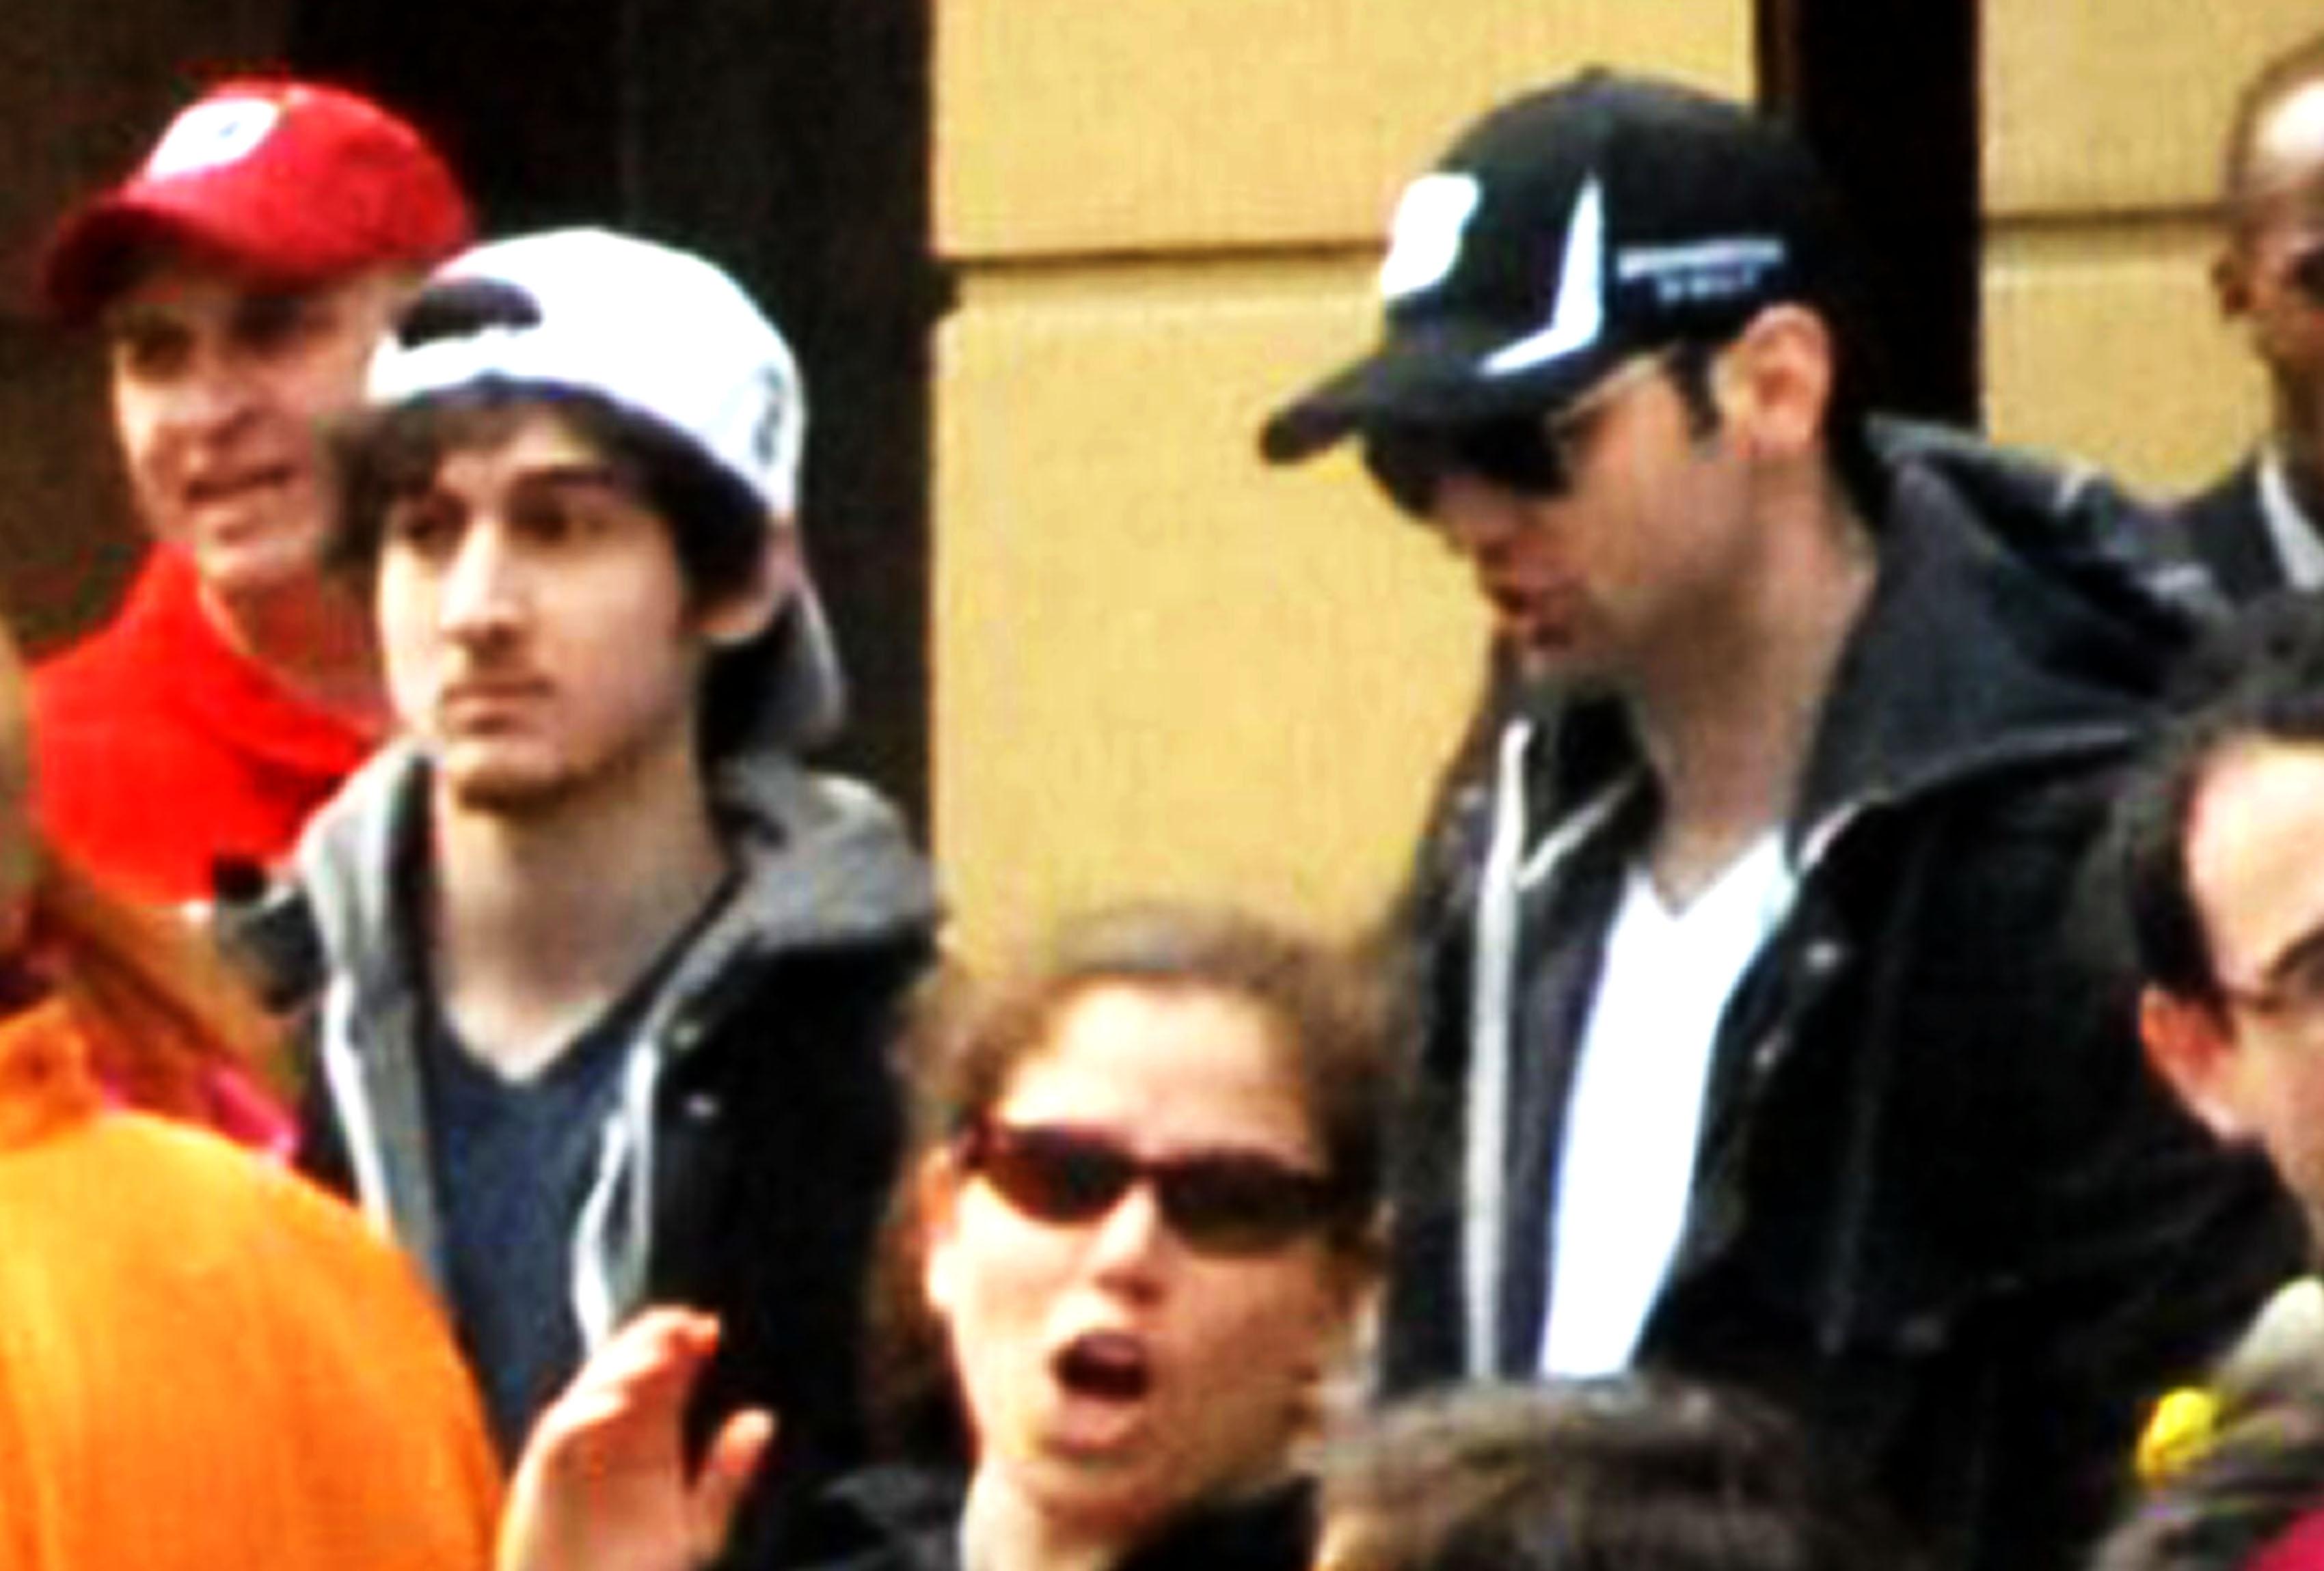 Tsarnaev Brothers at the Boston Marathon